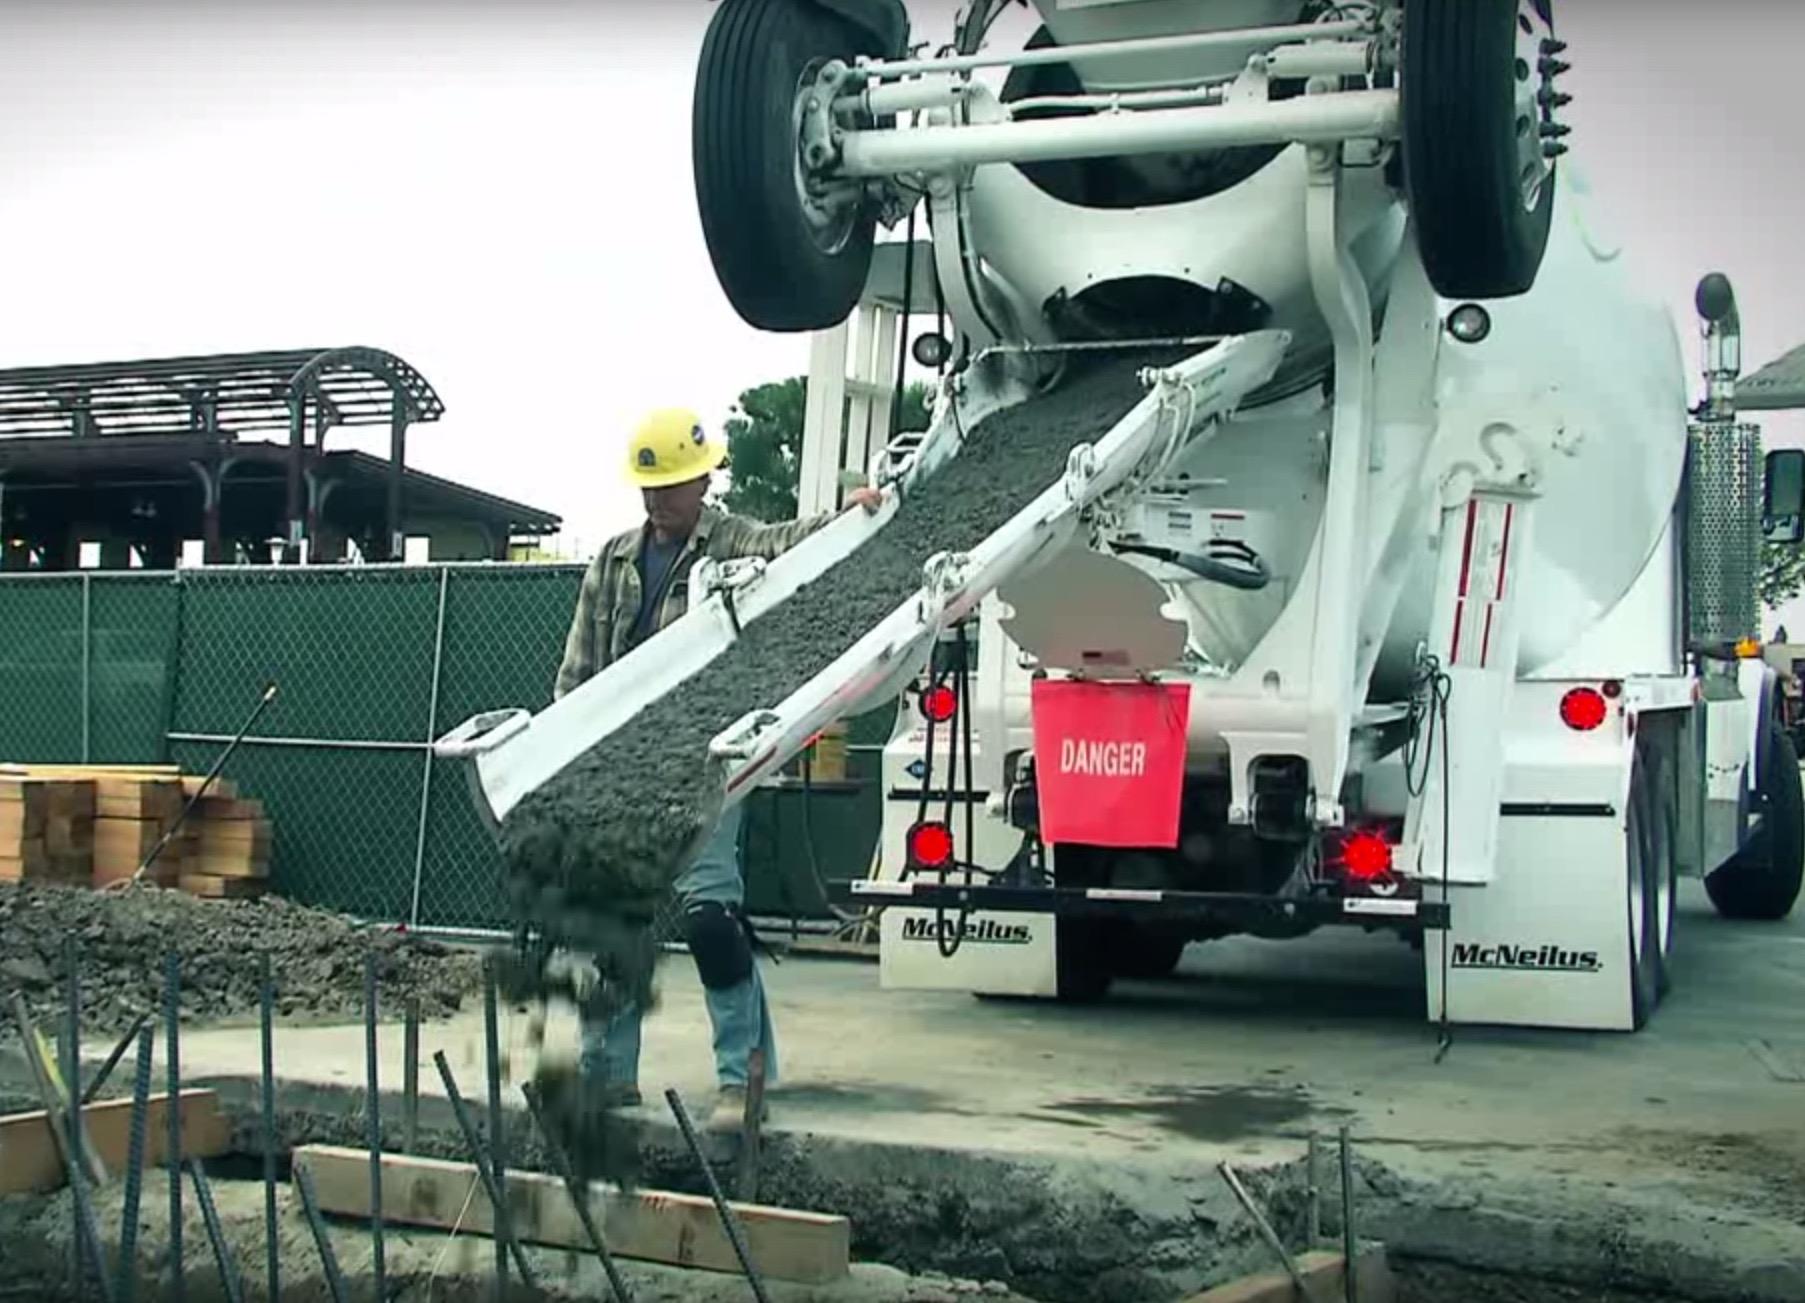 McNeilus, Oshkosh Recall CNG Trucks for Fire Risk